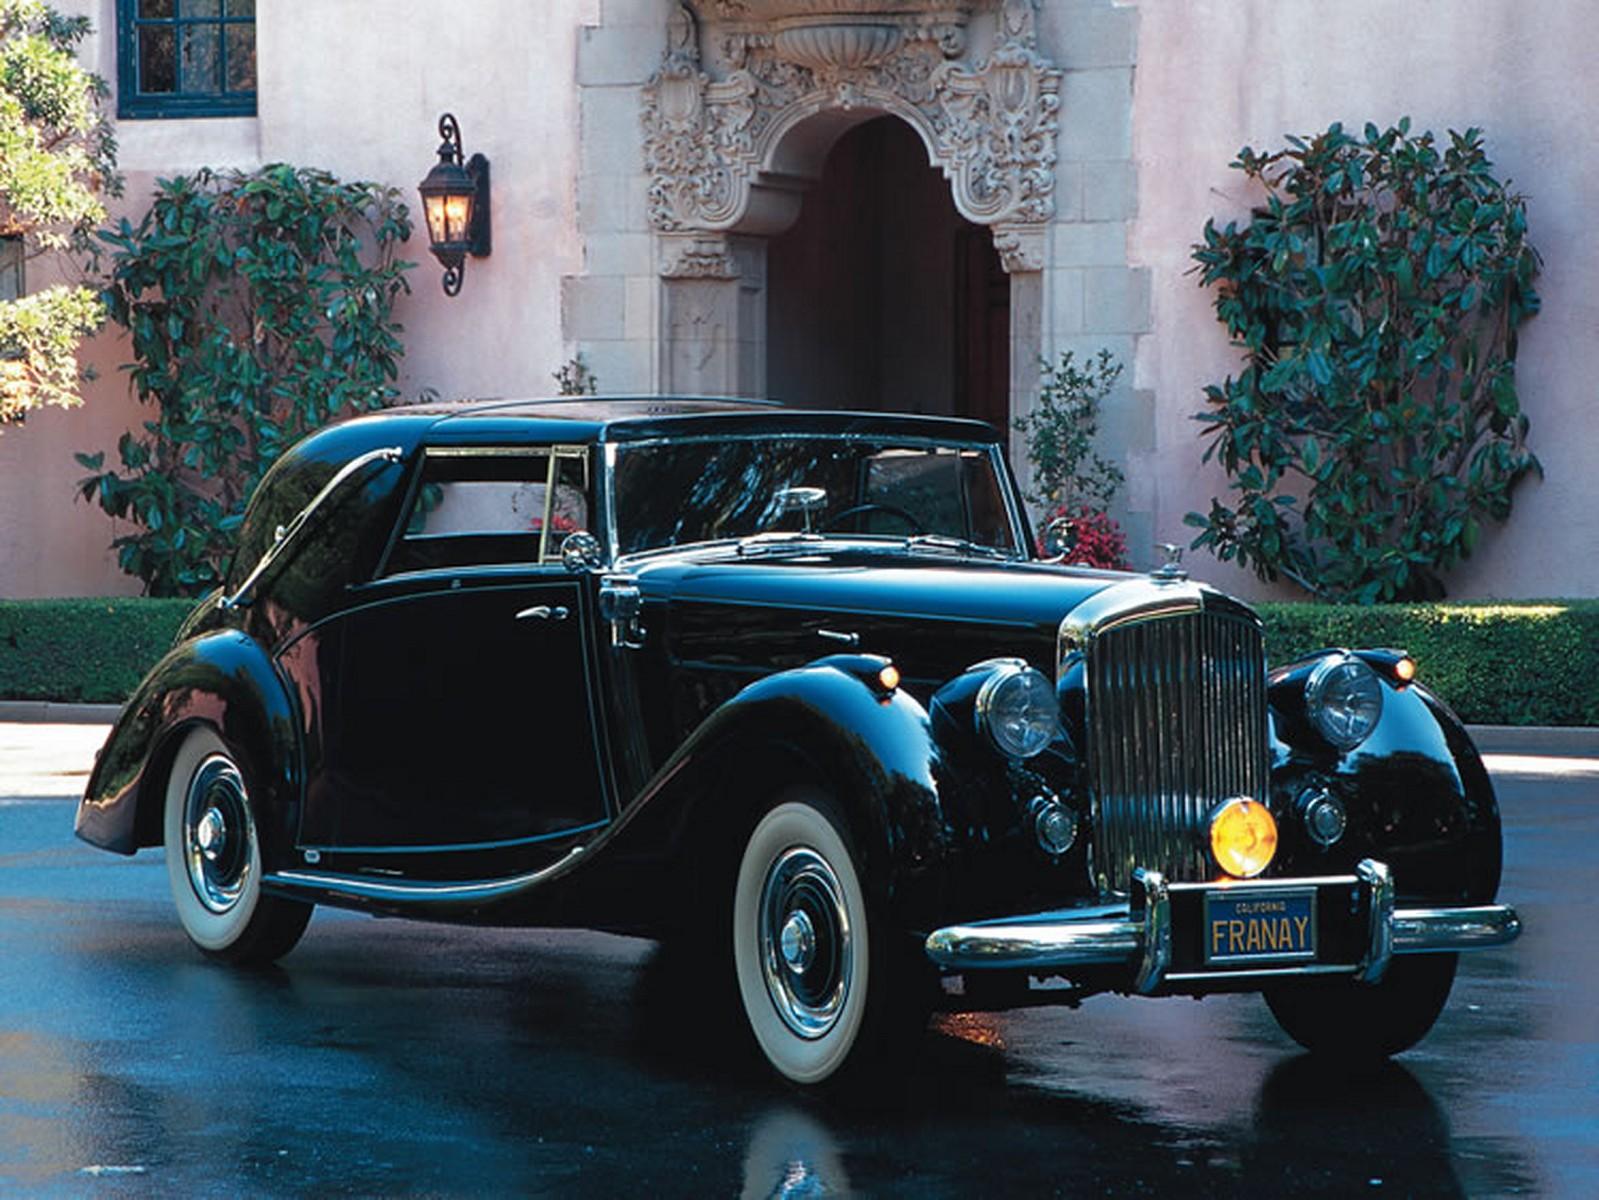 bentley cars google antique rolls classic royce coupe truck vehicles amazing